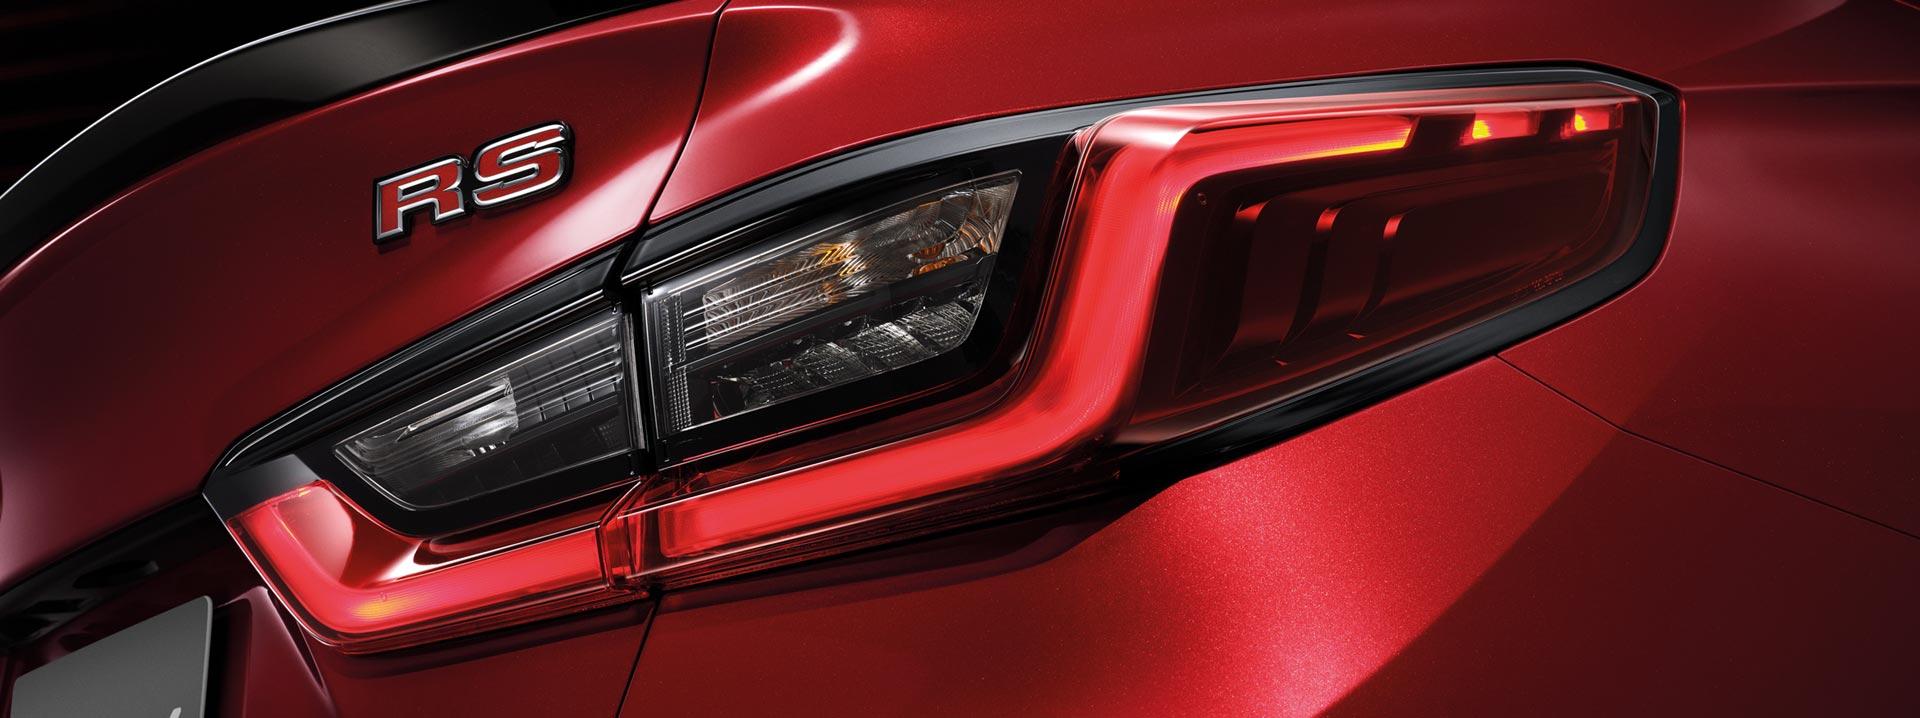 Nuevo Honda City RS 2020